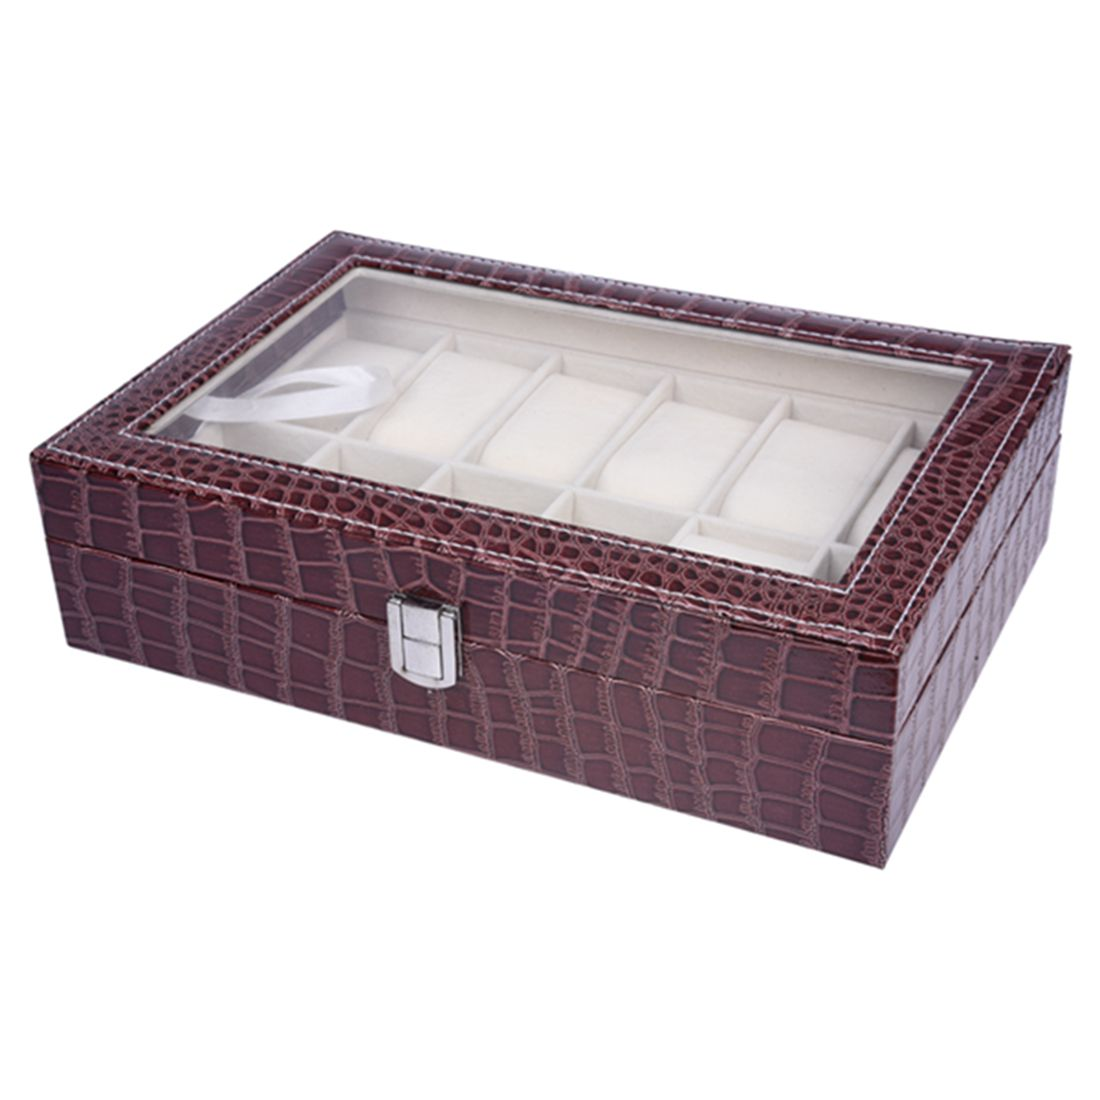 Faux Leather Watch Case Storage Display Box Organiser Jewelry Glass Top Crocodile Brown, 3SIZE